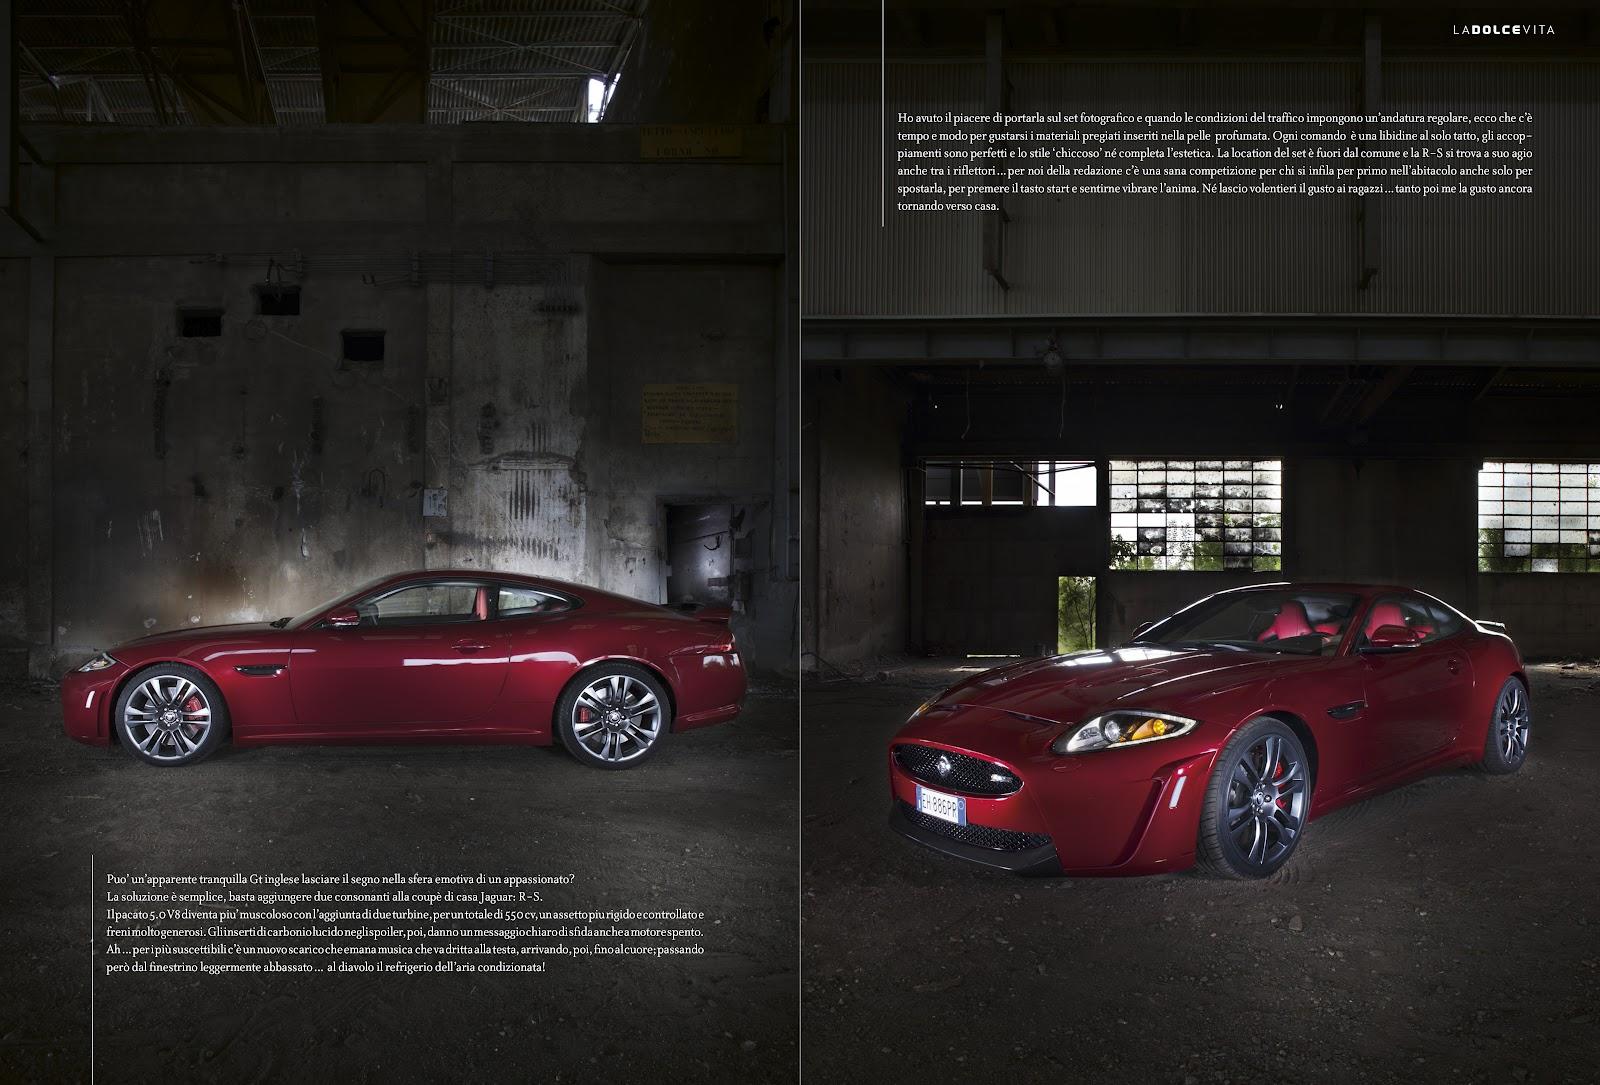 claudio amadei revolution ed estate nuova jaguar xk r s 550cv. Black Bedroom Furniture Sets. Home Design Ideas